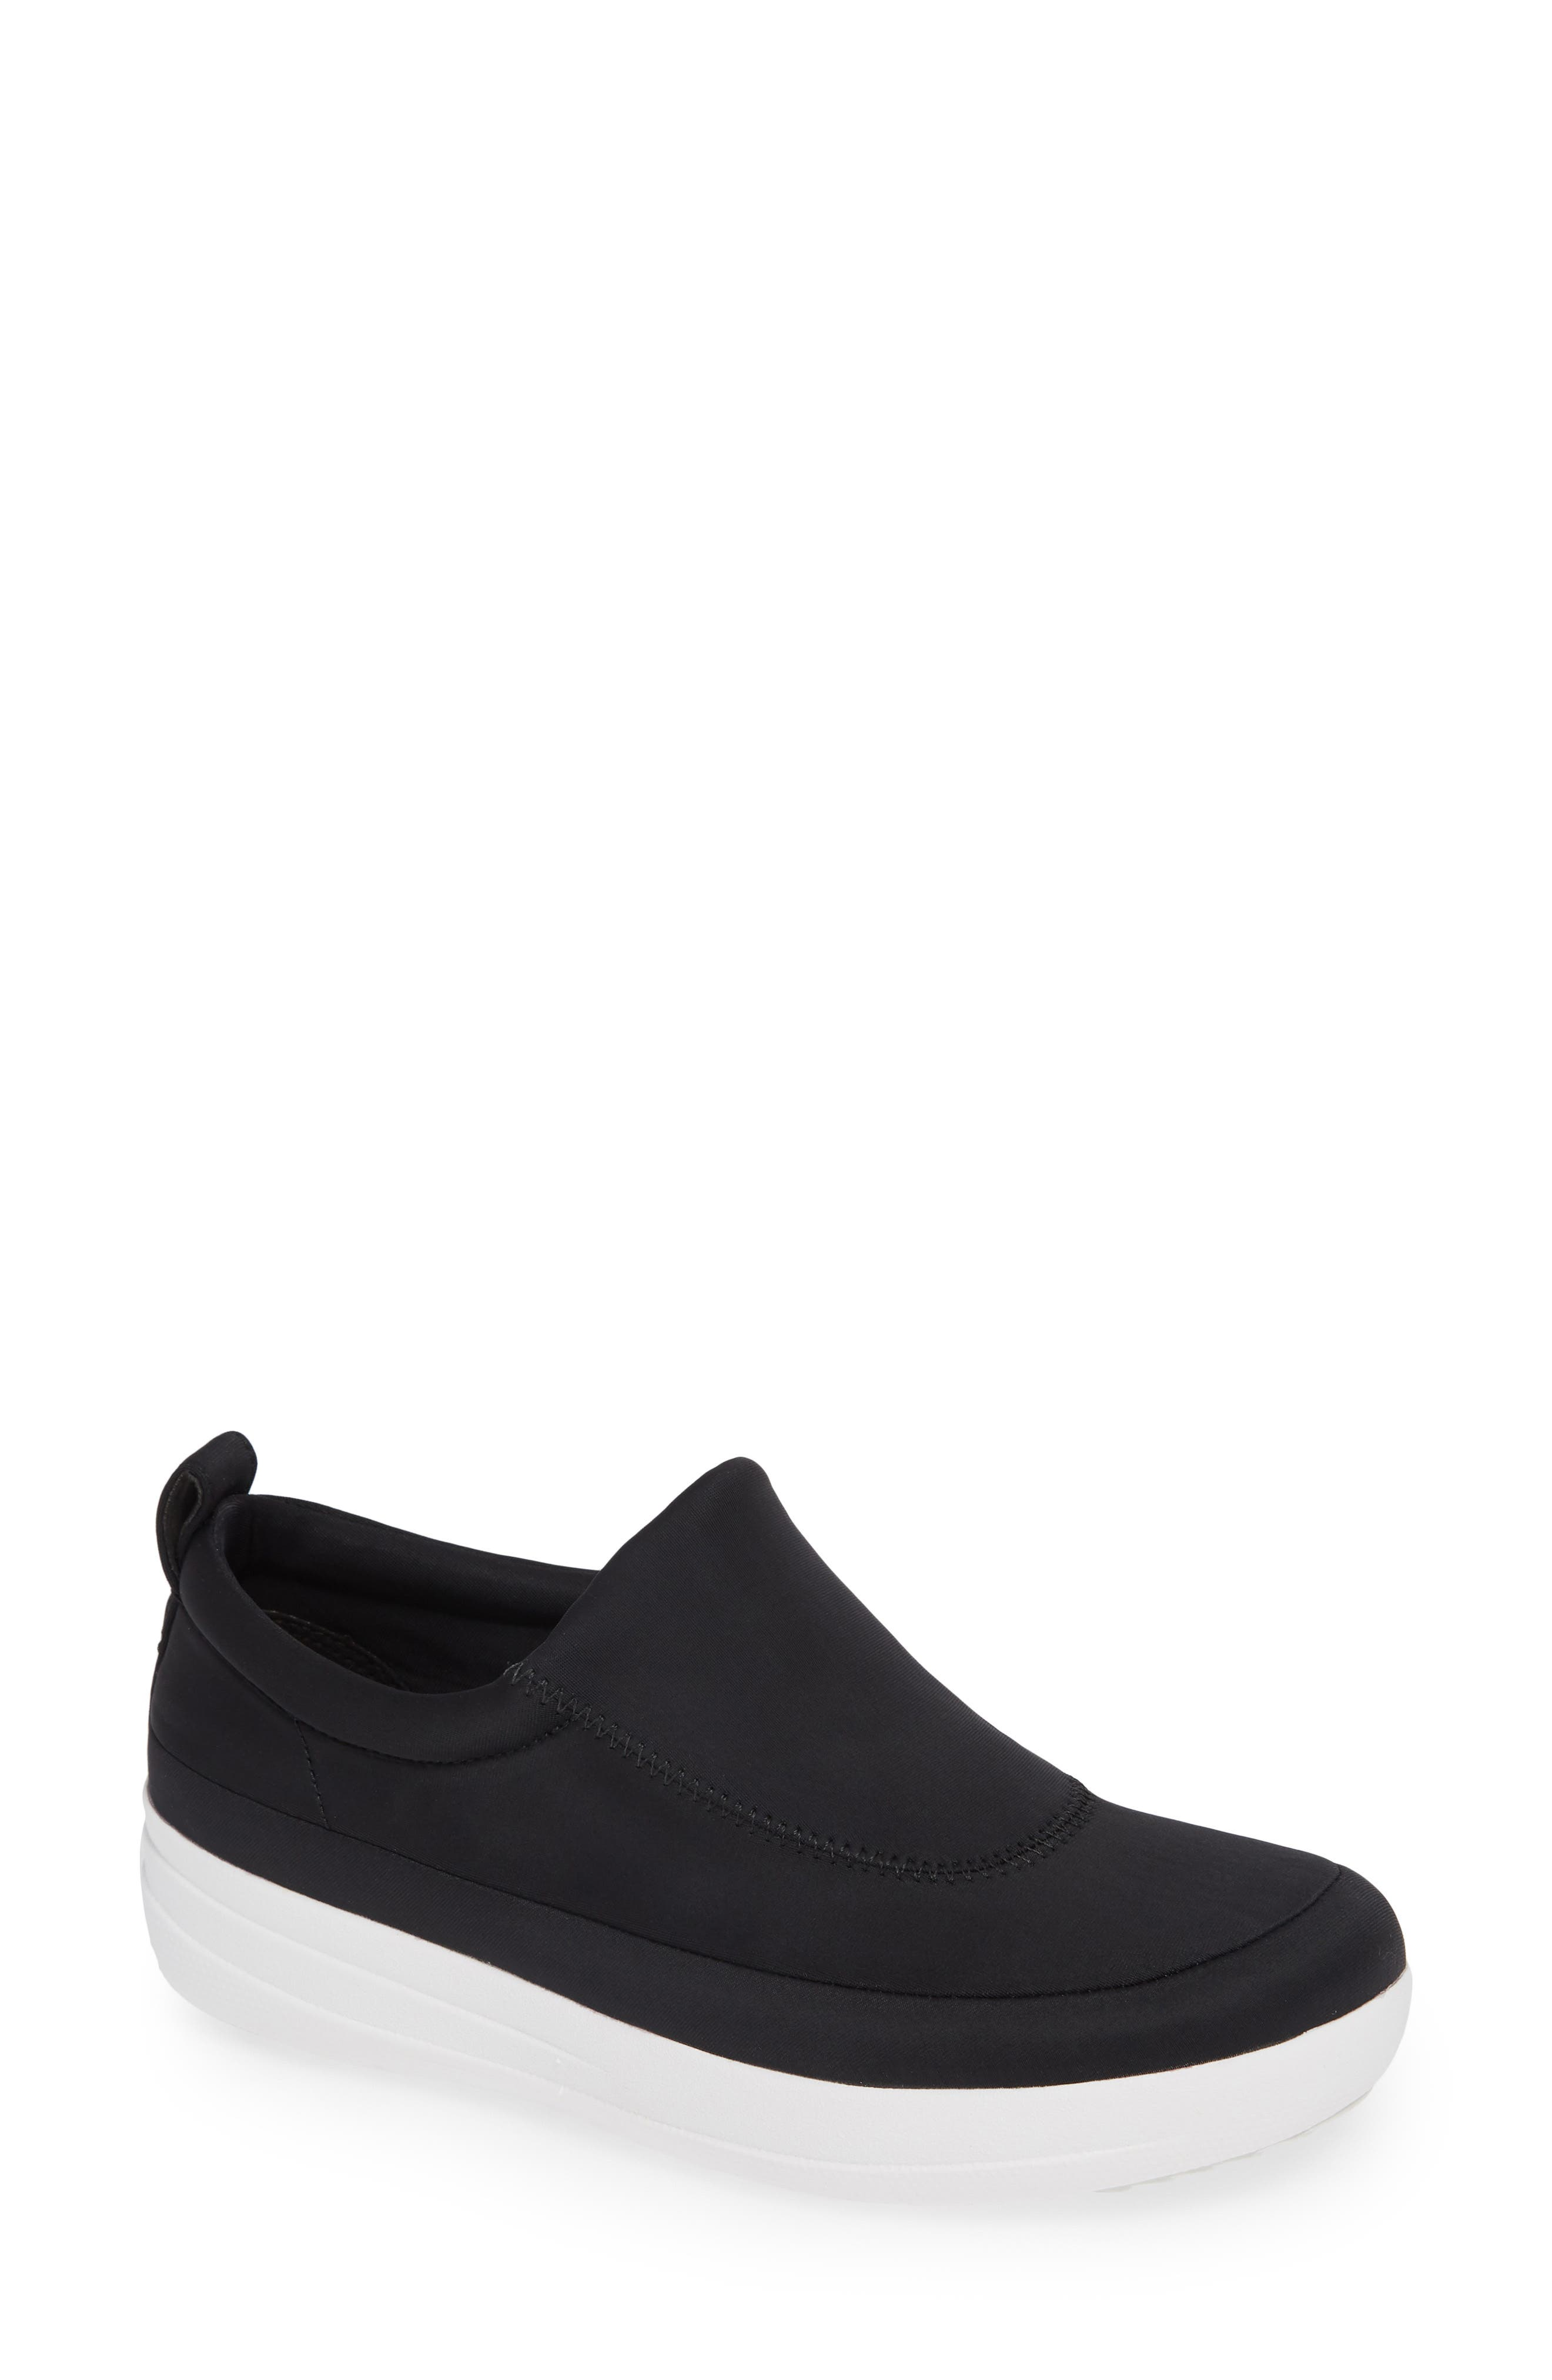 Freeflex Slip-On Sneaker,                         Main,                         color, BLACK FABRIC